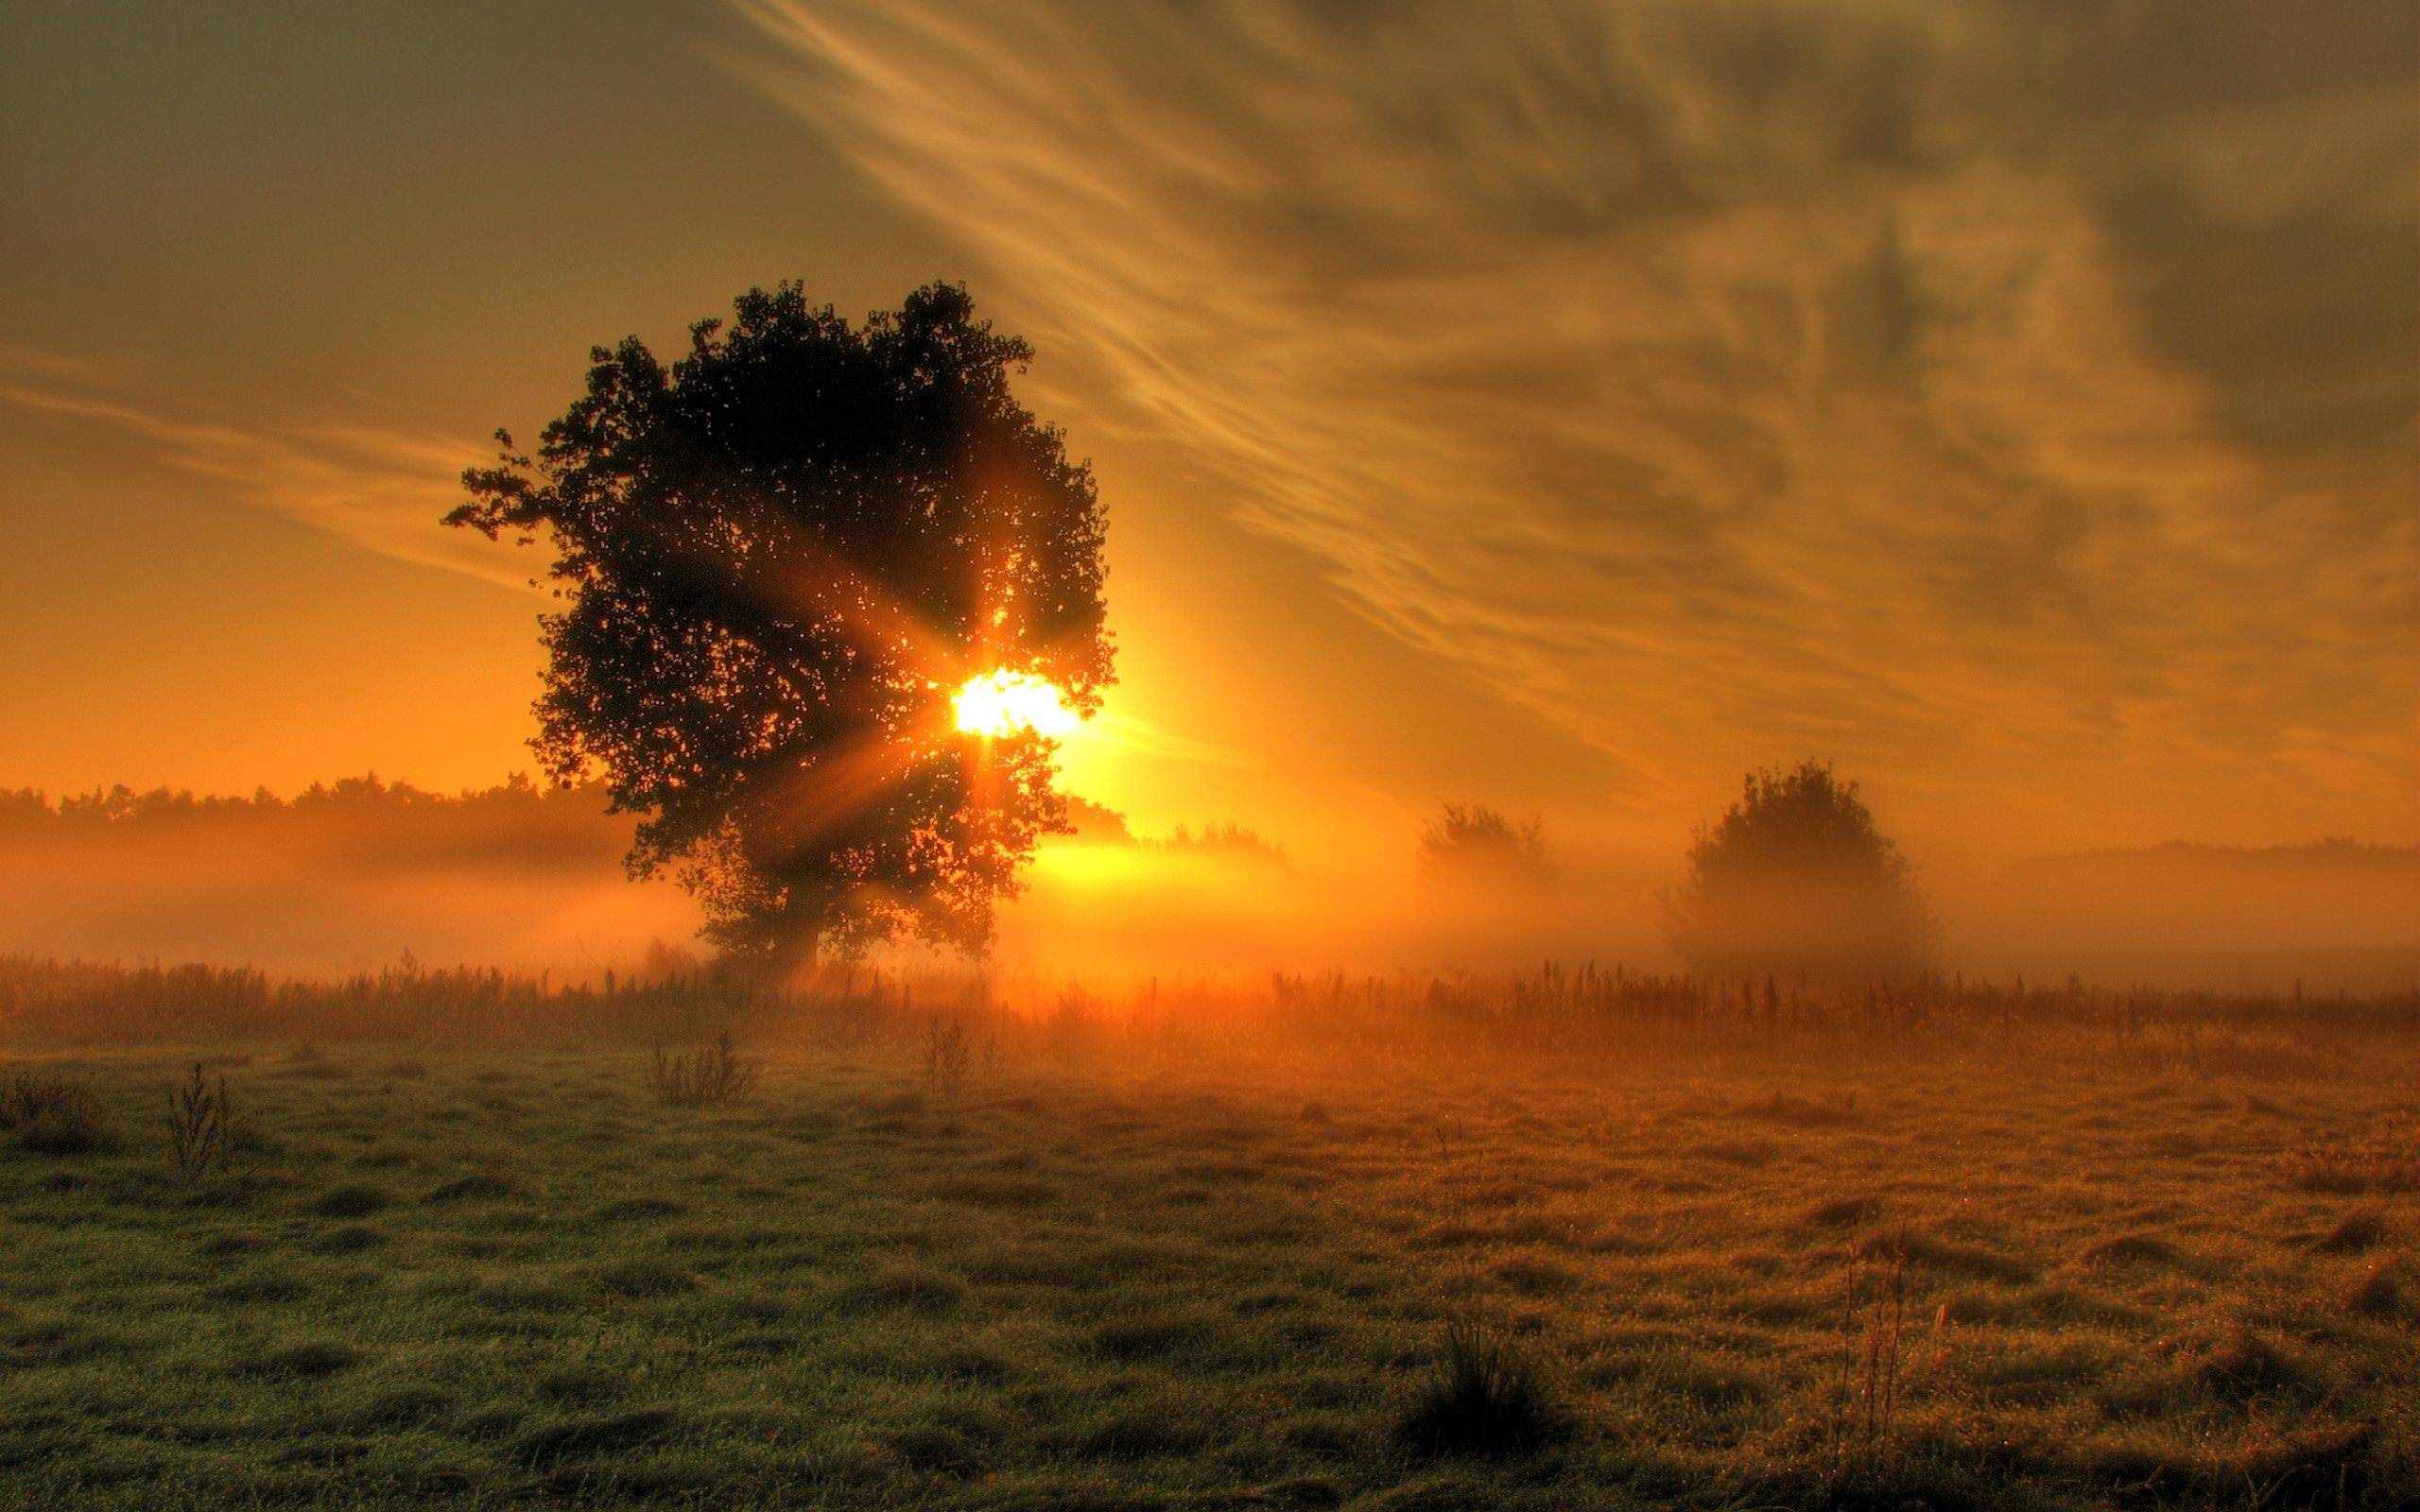 21 Sunrise Wallpapers Sunrays Backgrounds Images FreeCreatives